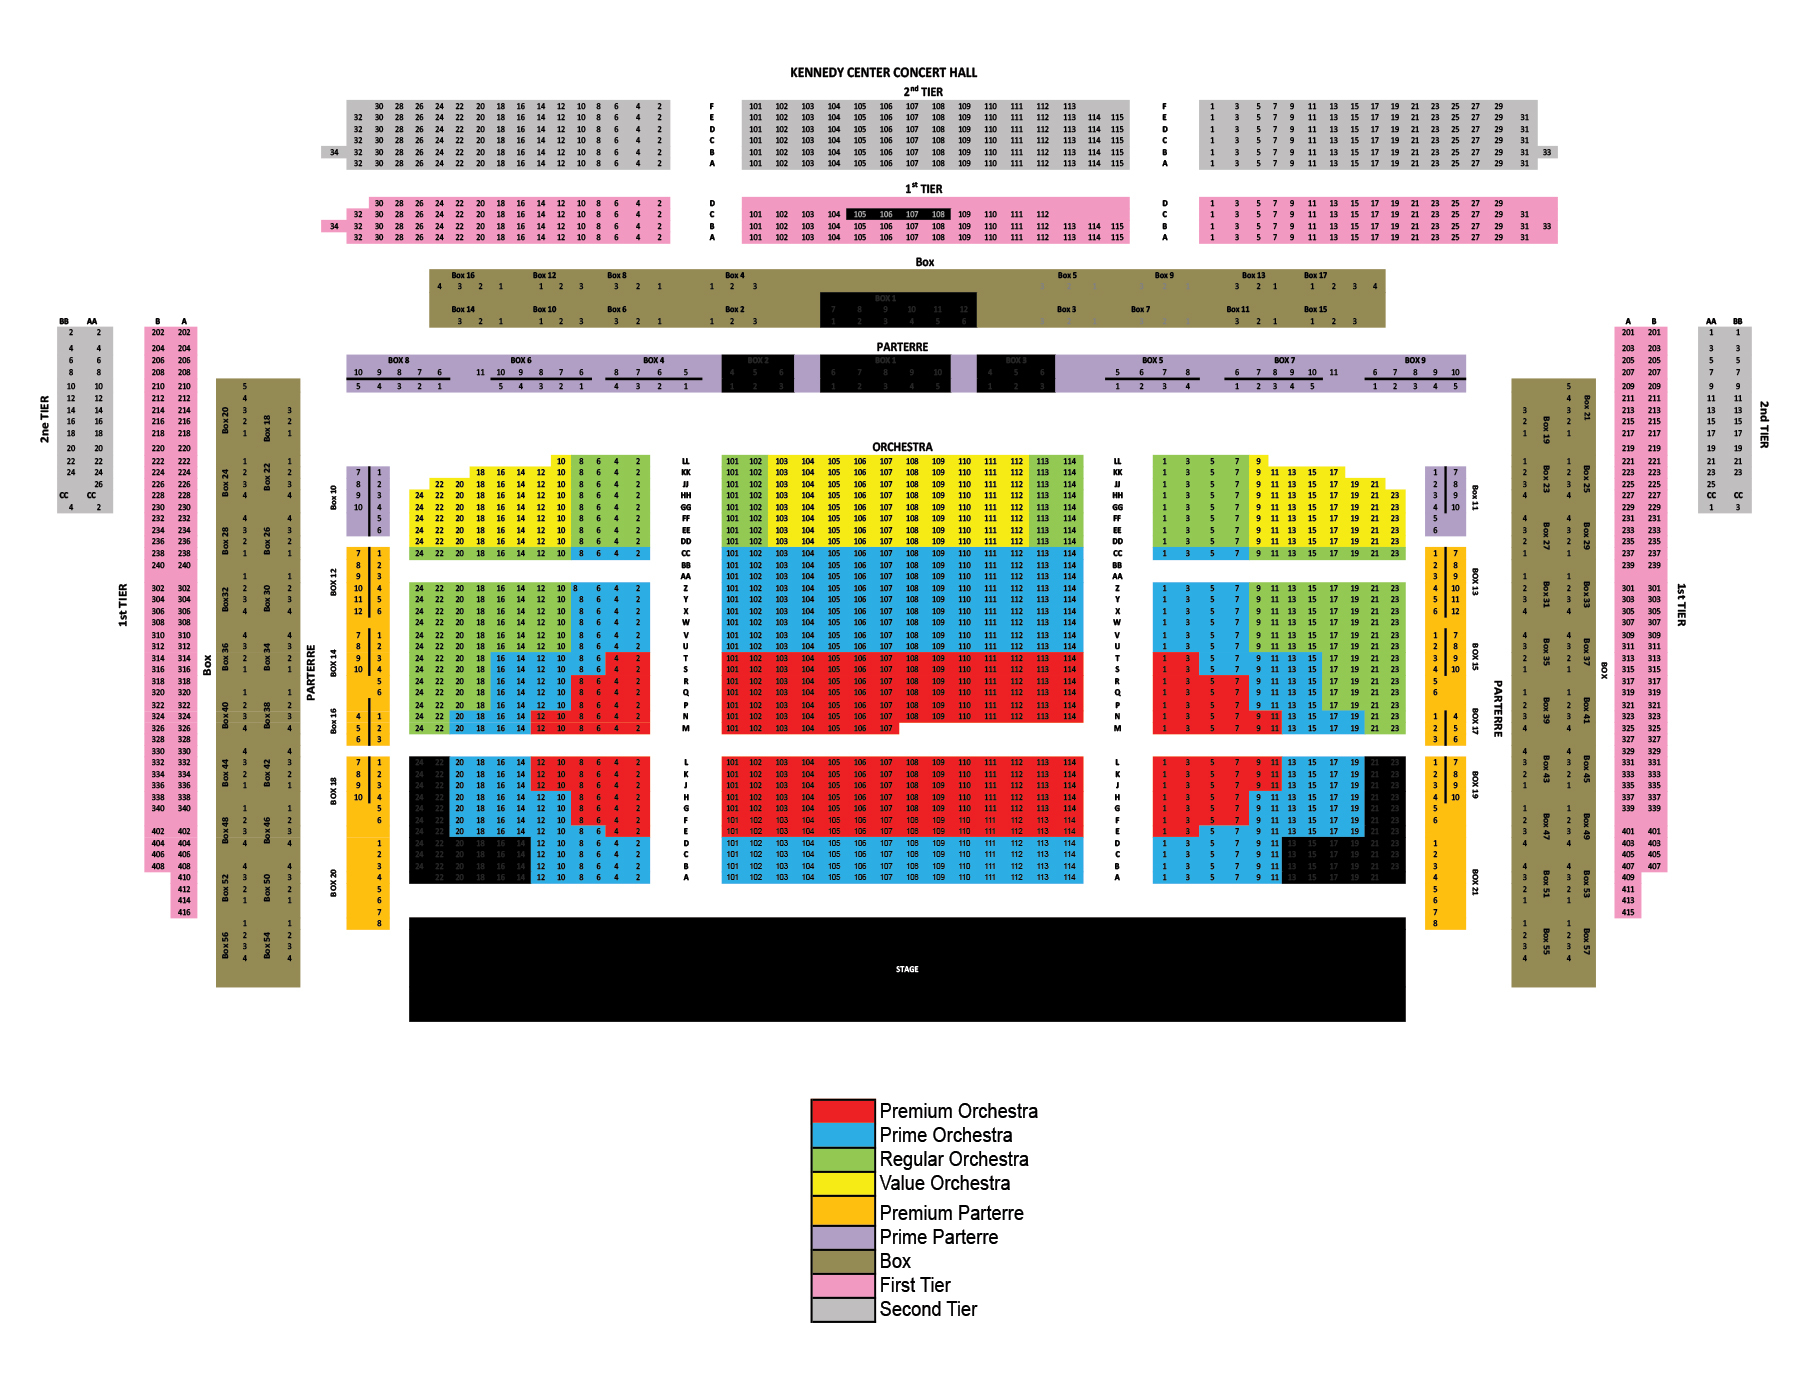 The kennedy center concert hall washington dc tickets schedule